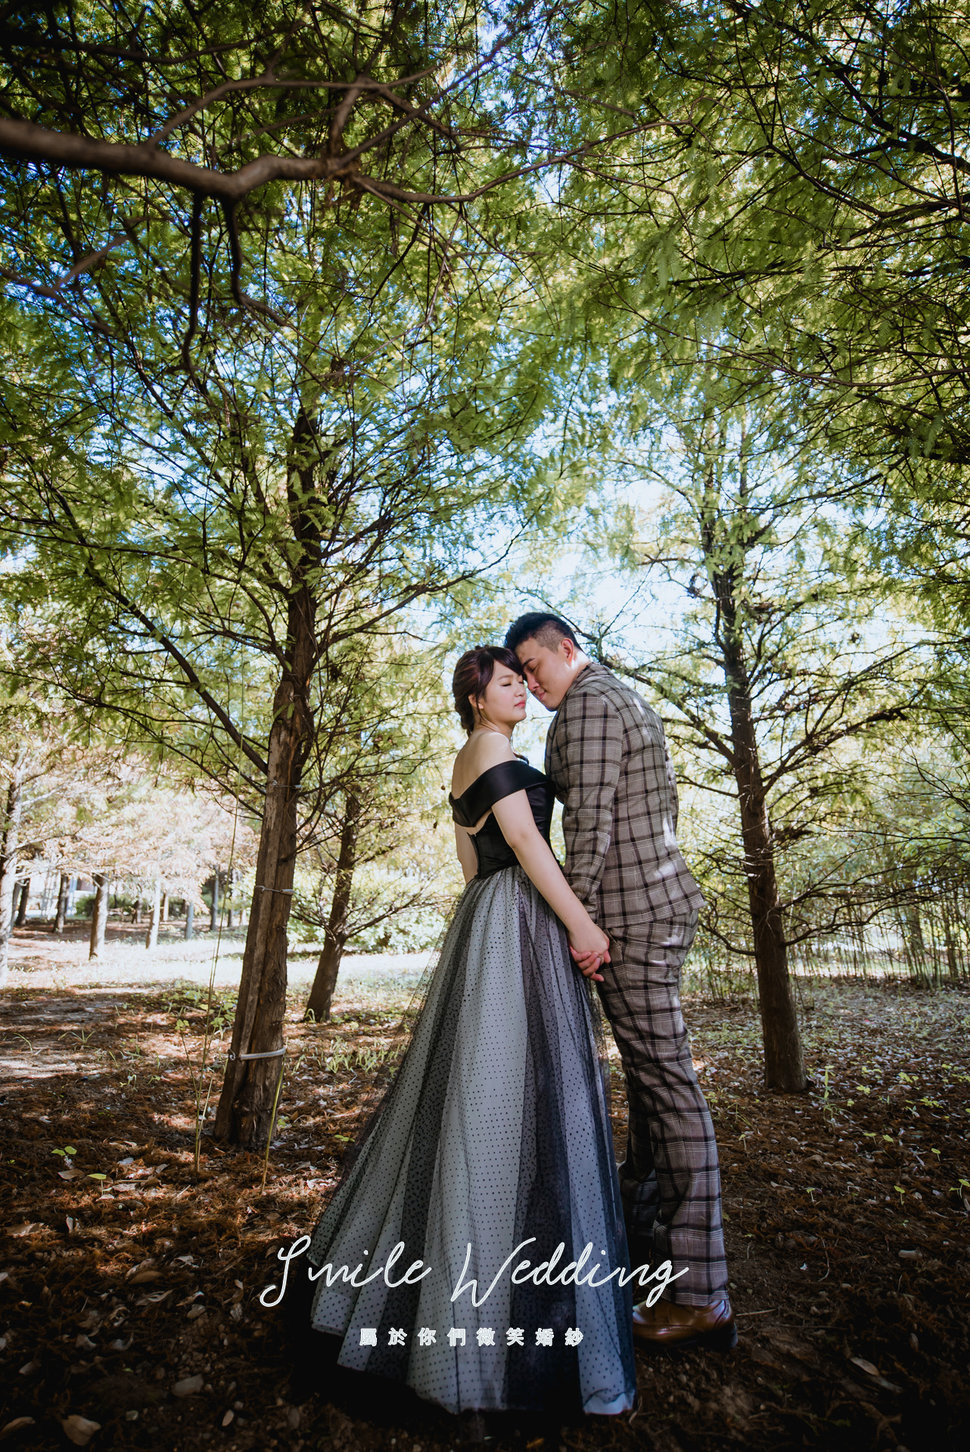 WEI_4479 - Smile wedding 微笑婚紗《結婚吧》